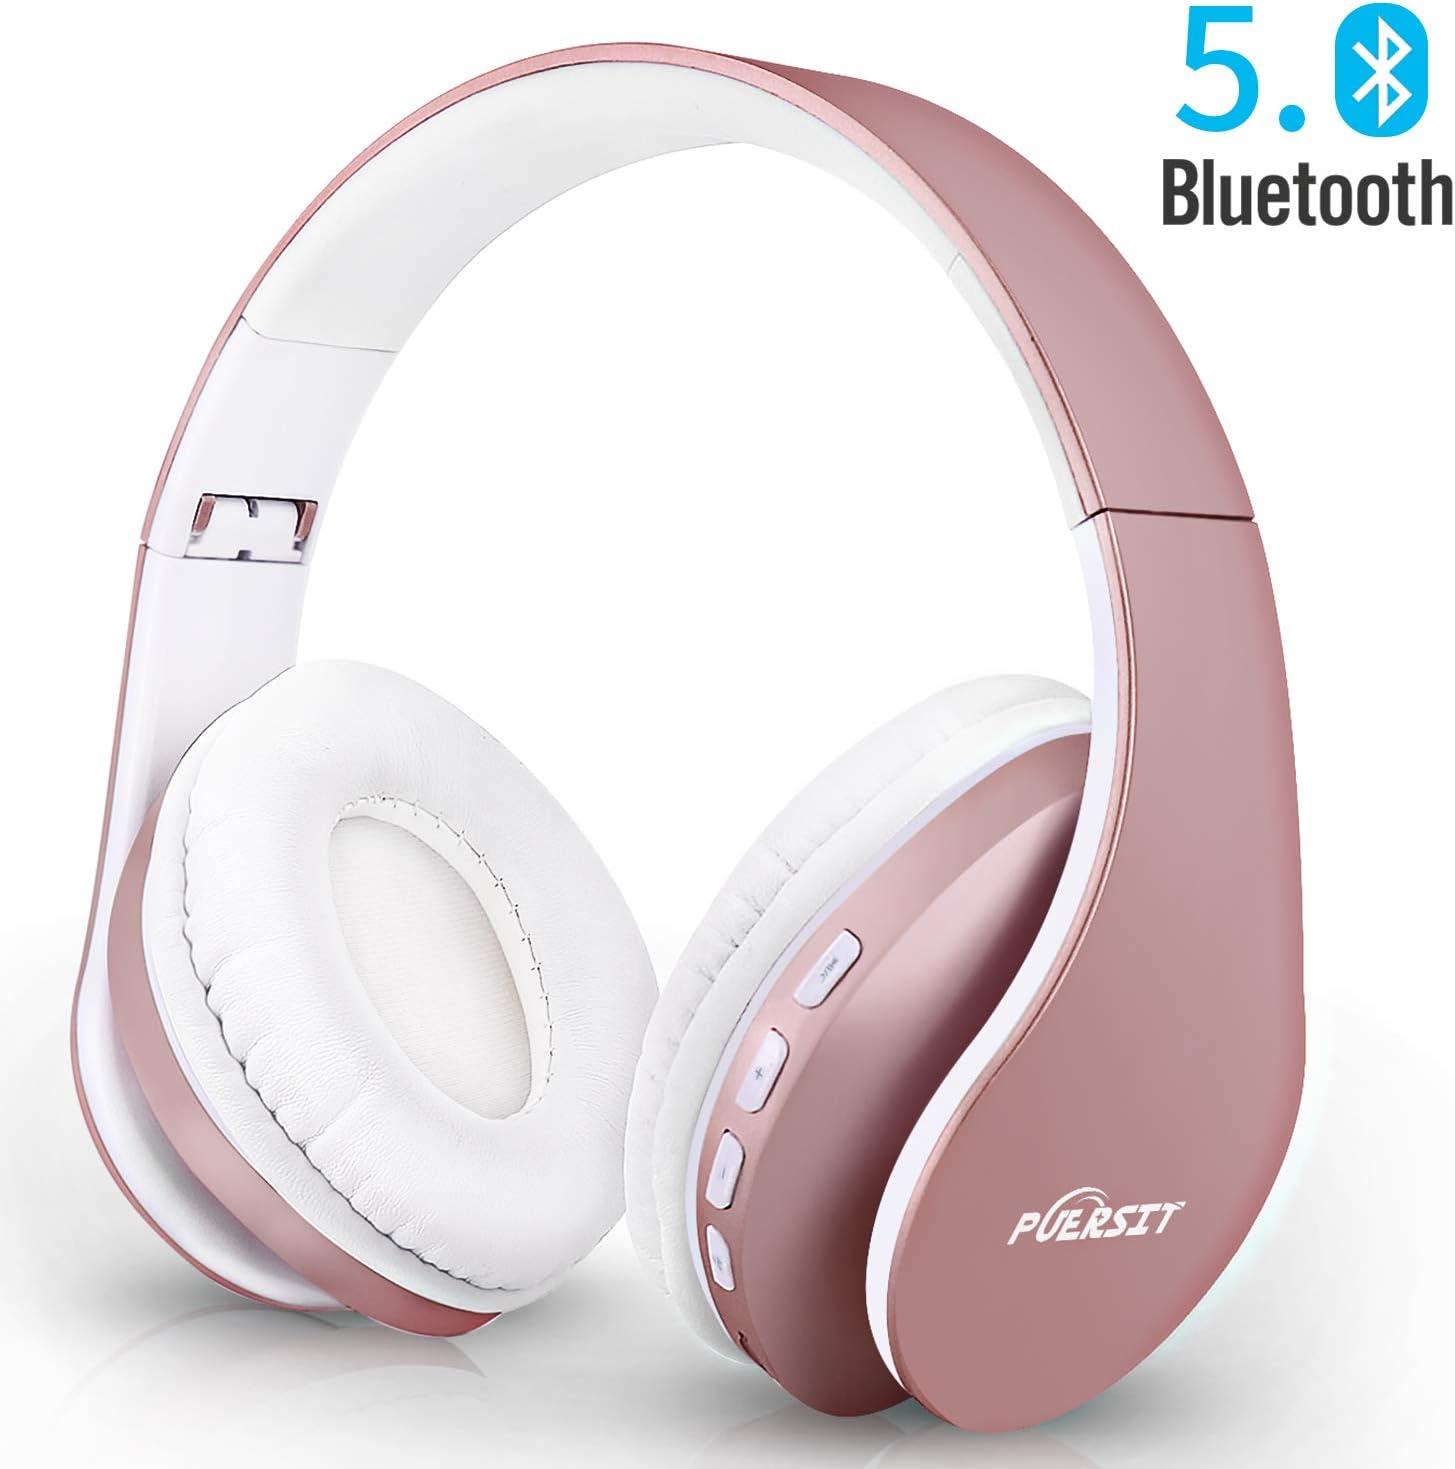 Puersit Auriculares Bluetooth con Micrófono, Plegable Hi-Fi Sonido Estéreo Inalámbricos Cascos para Tableta, Movil, TV Inteligente con Bluetooth